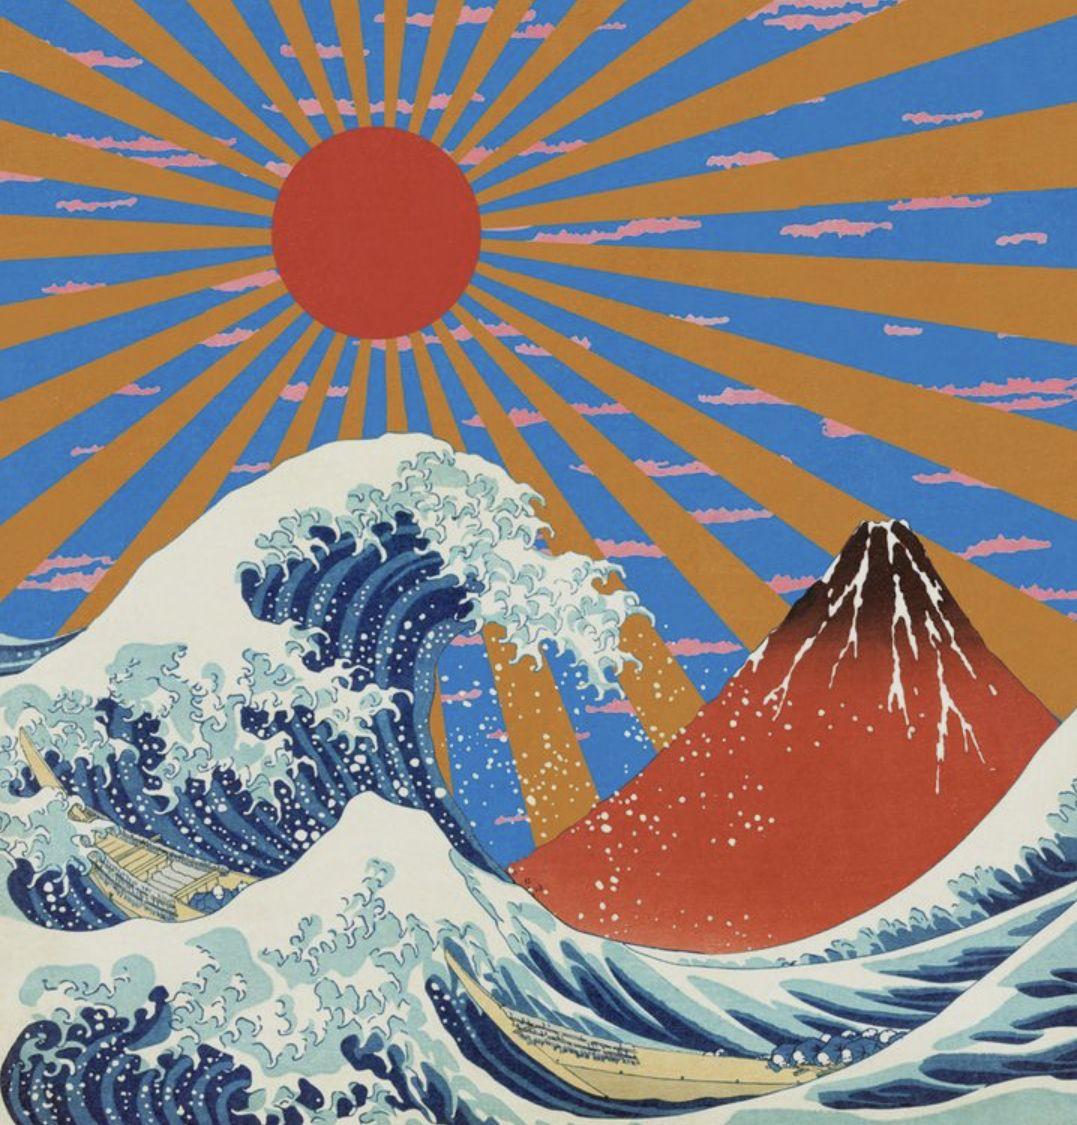 I Love Kyokujitsuki 旭日旗の愛 おしゃれまとめの人気アイデア Pinterest Yuki 日本 イラスト 日本画 大漁 旗